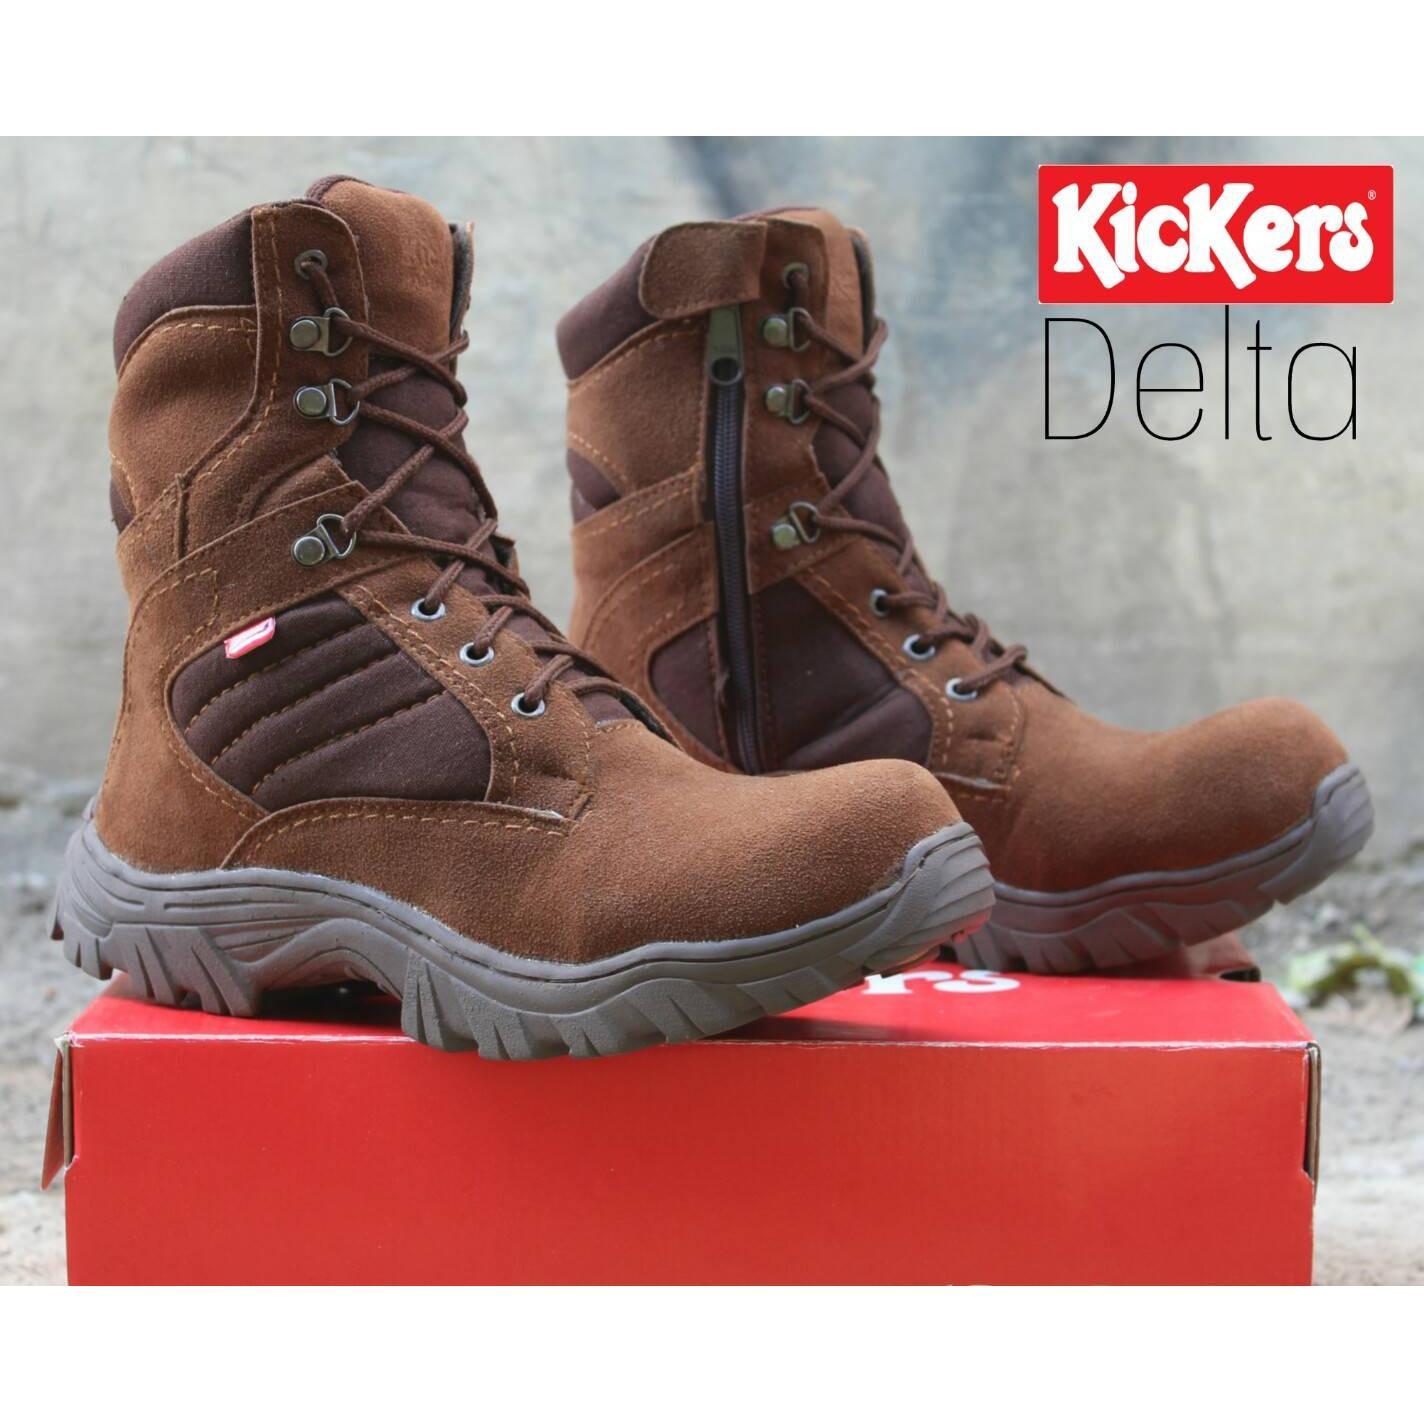 Sepatu Kickers High Delta Safety Boots Ujung Besi Tracking Touring Motor Adventure Gurun Sepatu Outdoor Pdl